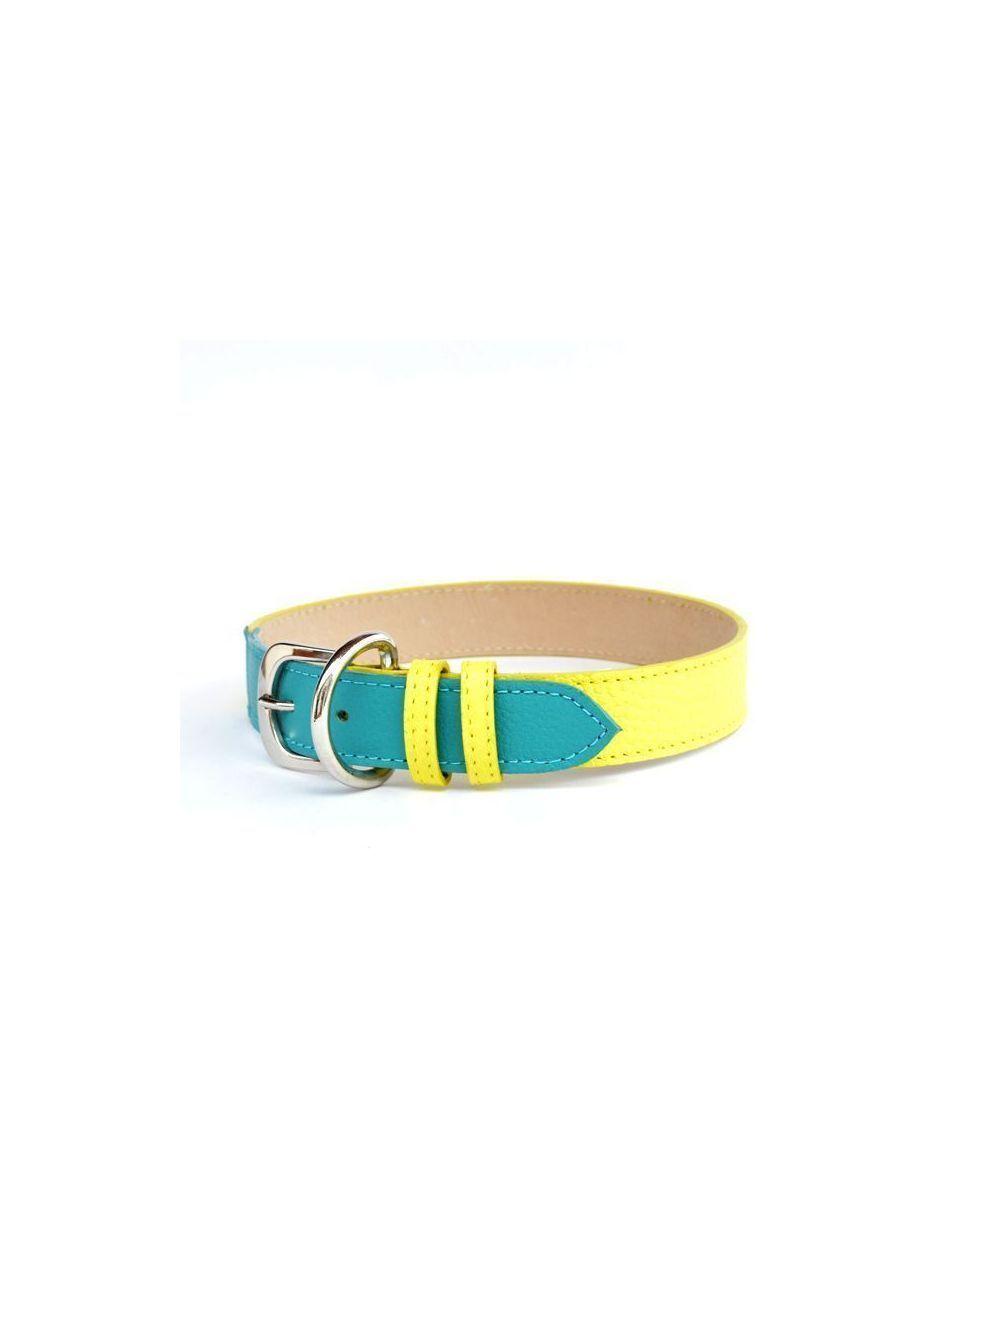 Collar azul y amarillo talla 4 - PRSR